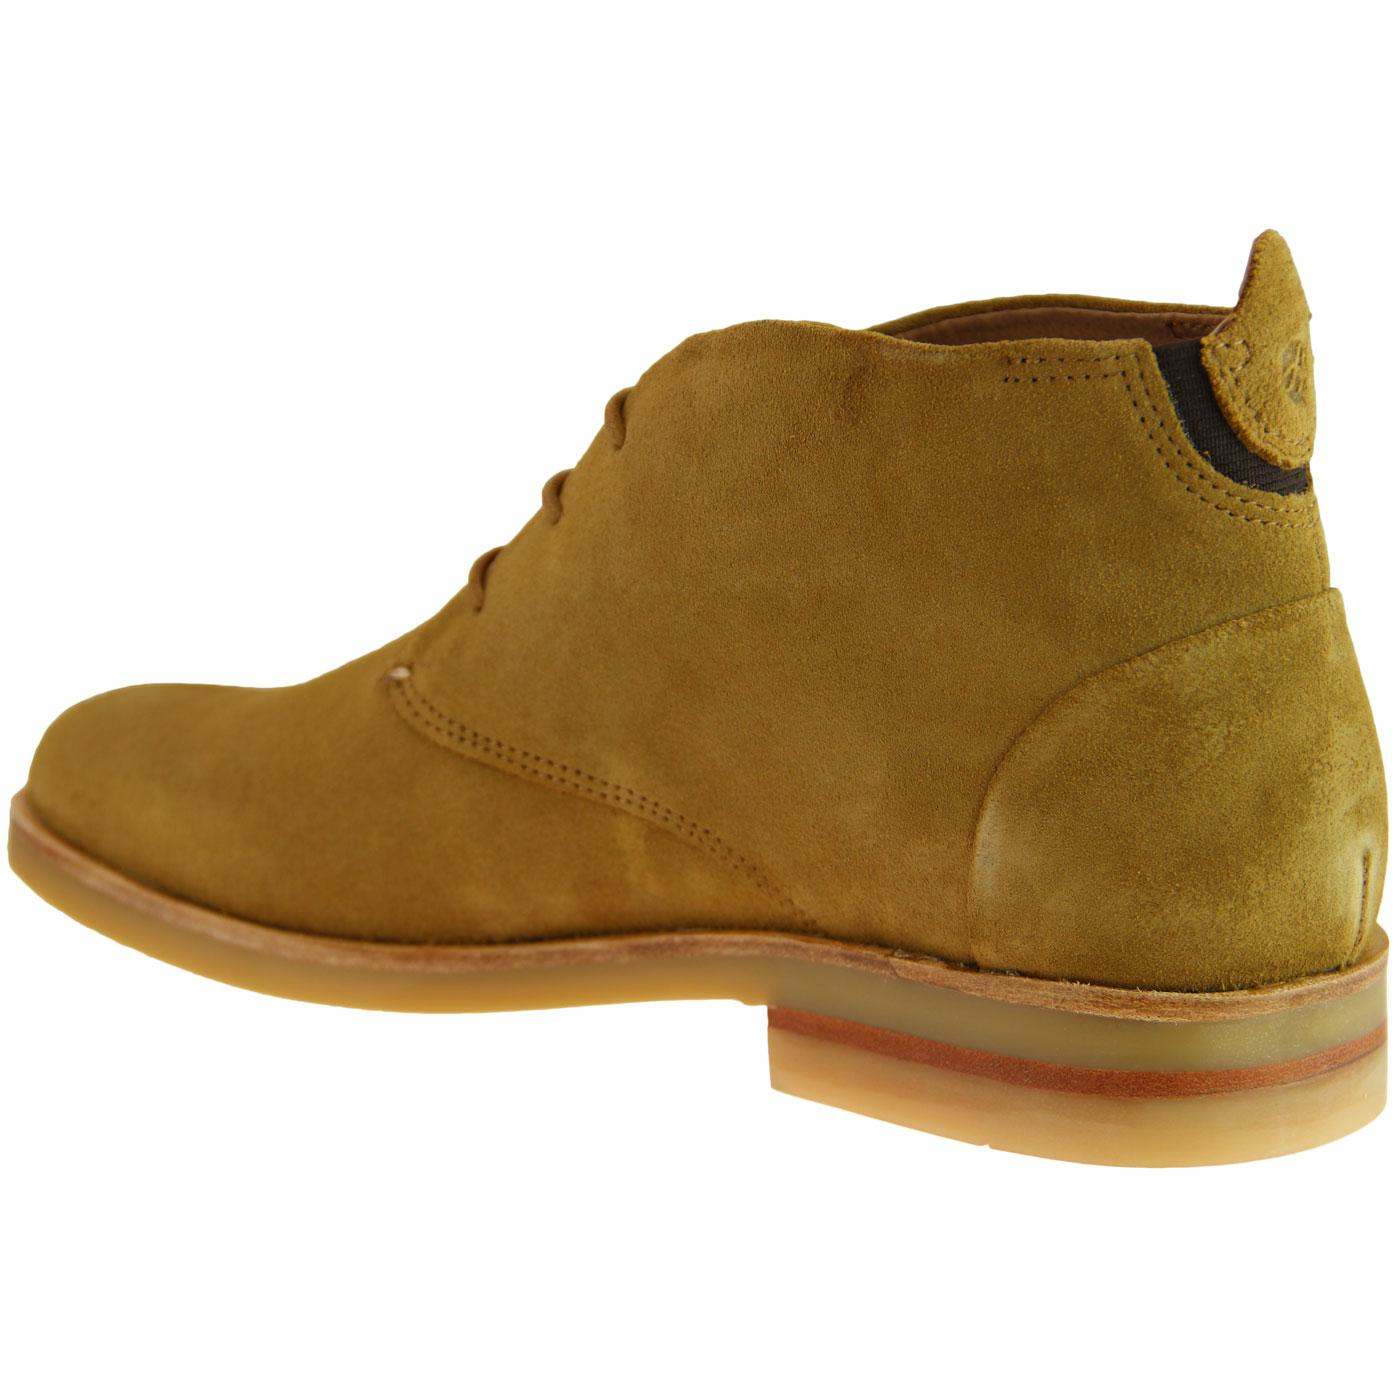 8c5df6da8e1 HUDSON Bedlington 1960s Mod Suede Desert Boots in Camel